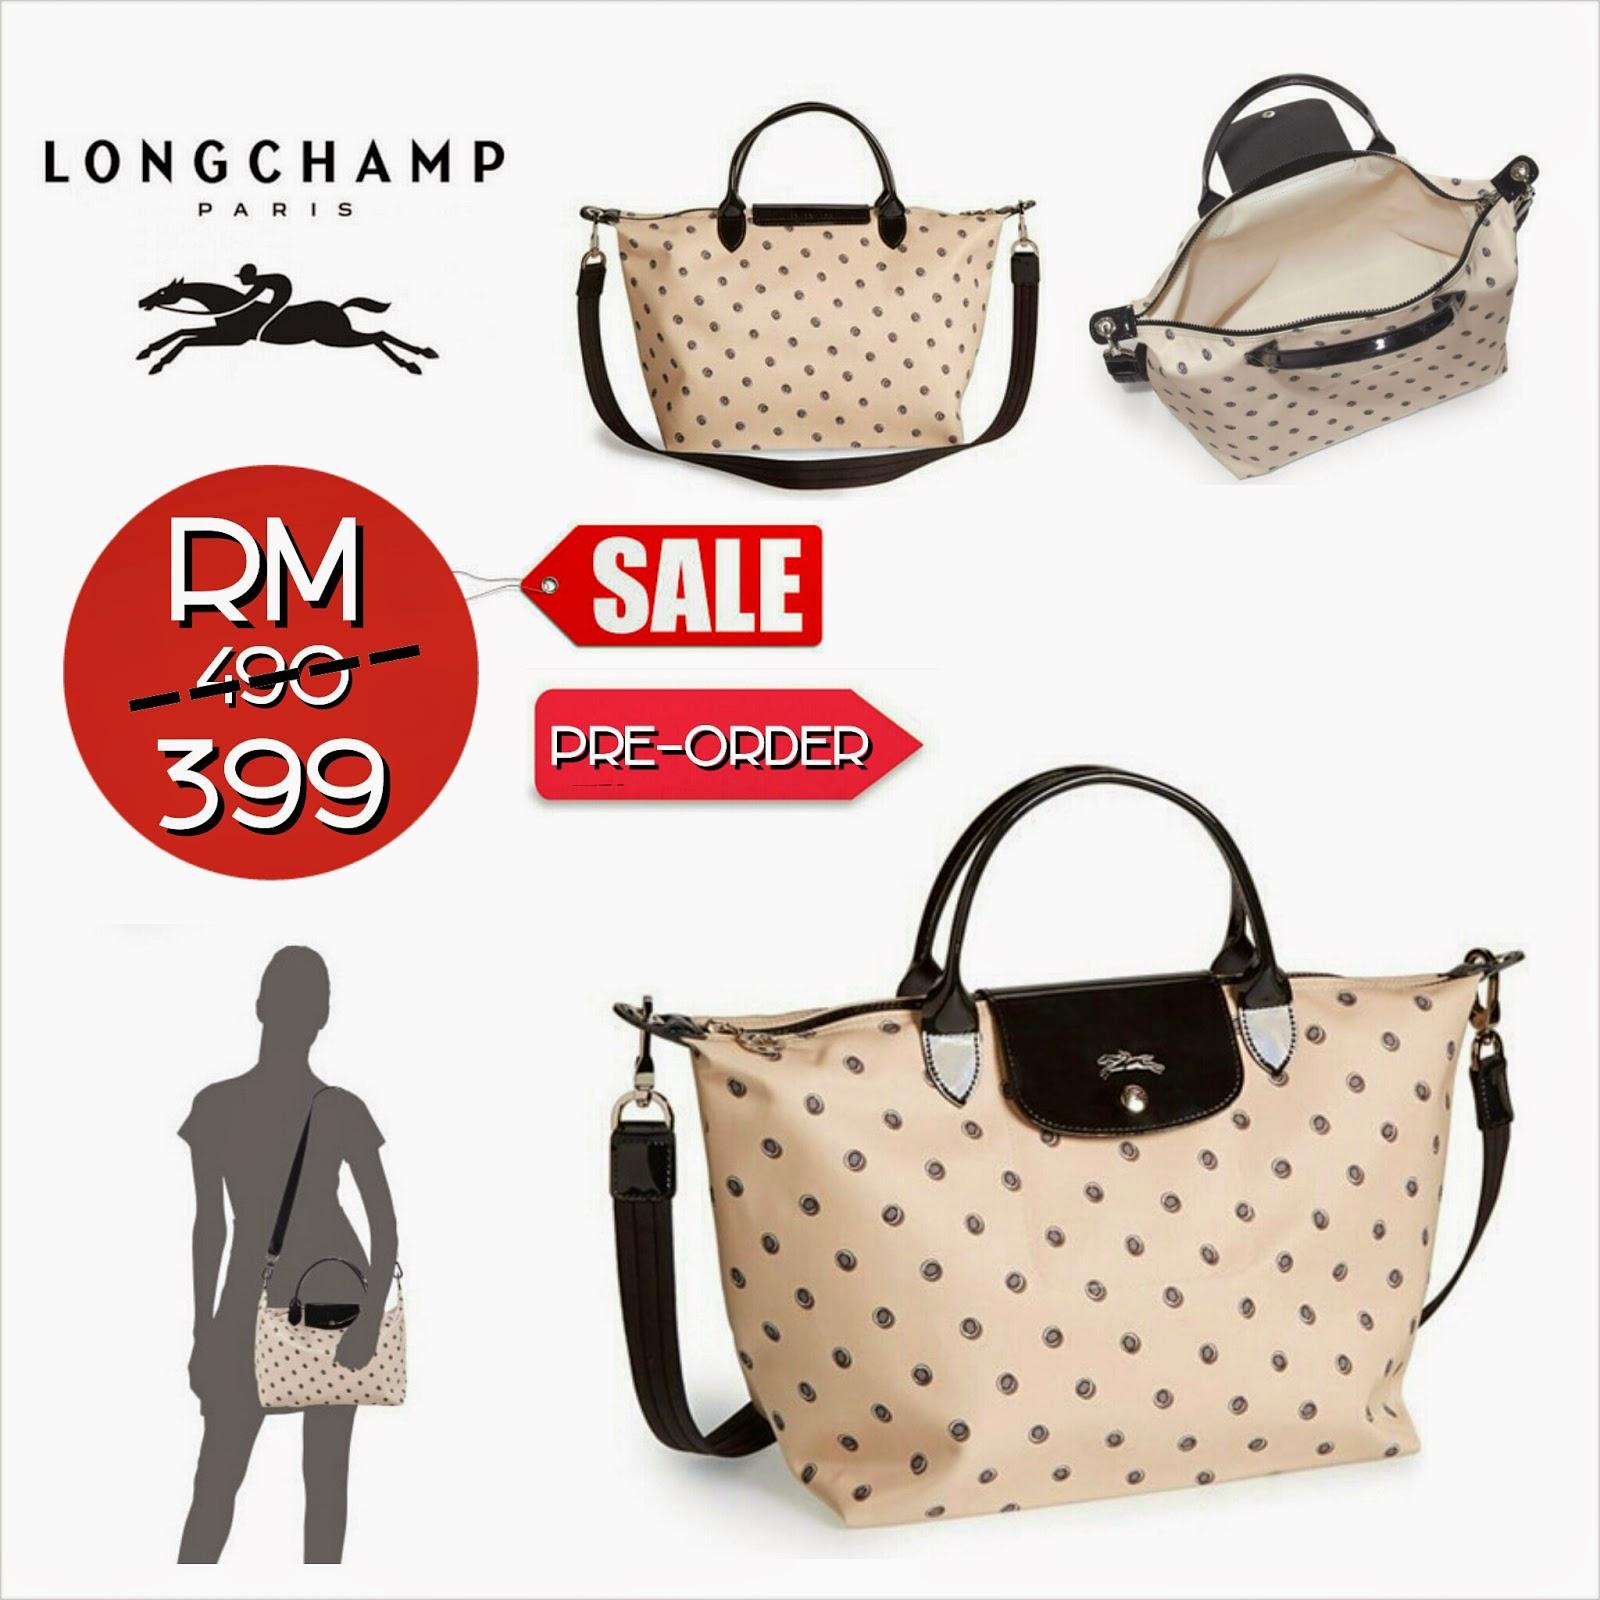 longchamp online malaysia longchamp wallet sale. Black Bedroom Furniture Sets. Home Design Ideas